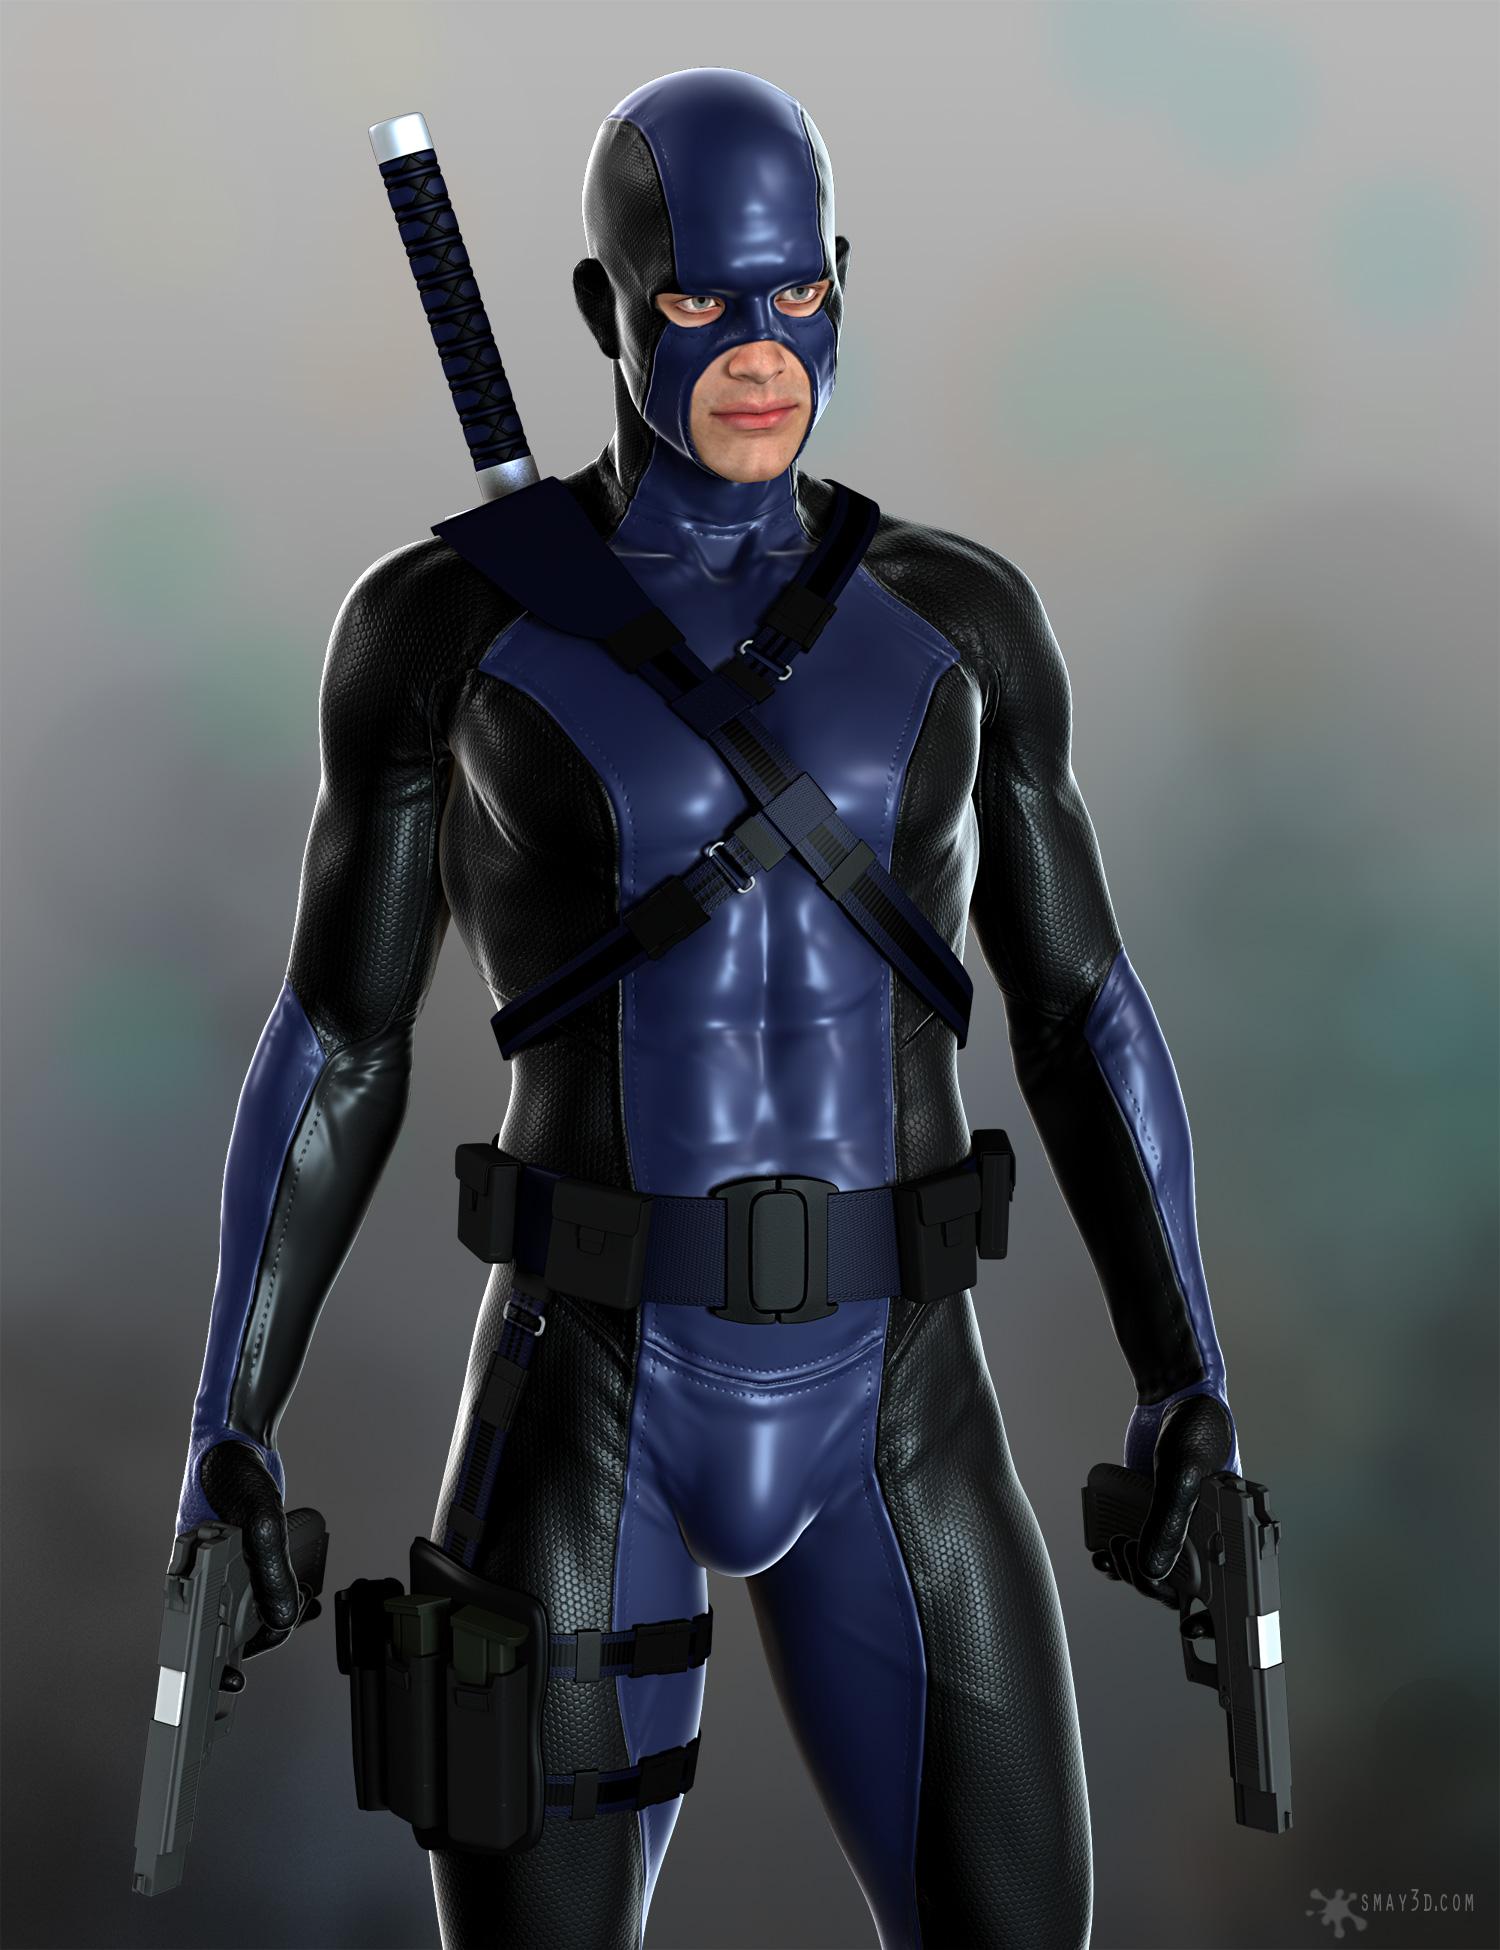 Super hero suit m6 01 by smay3d on deviantart - Moderne oudersuite ...